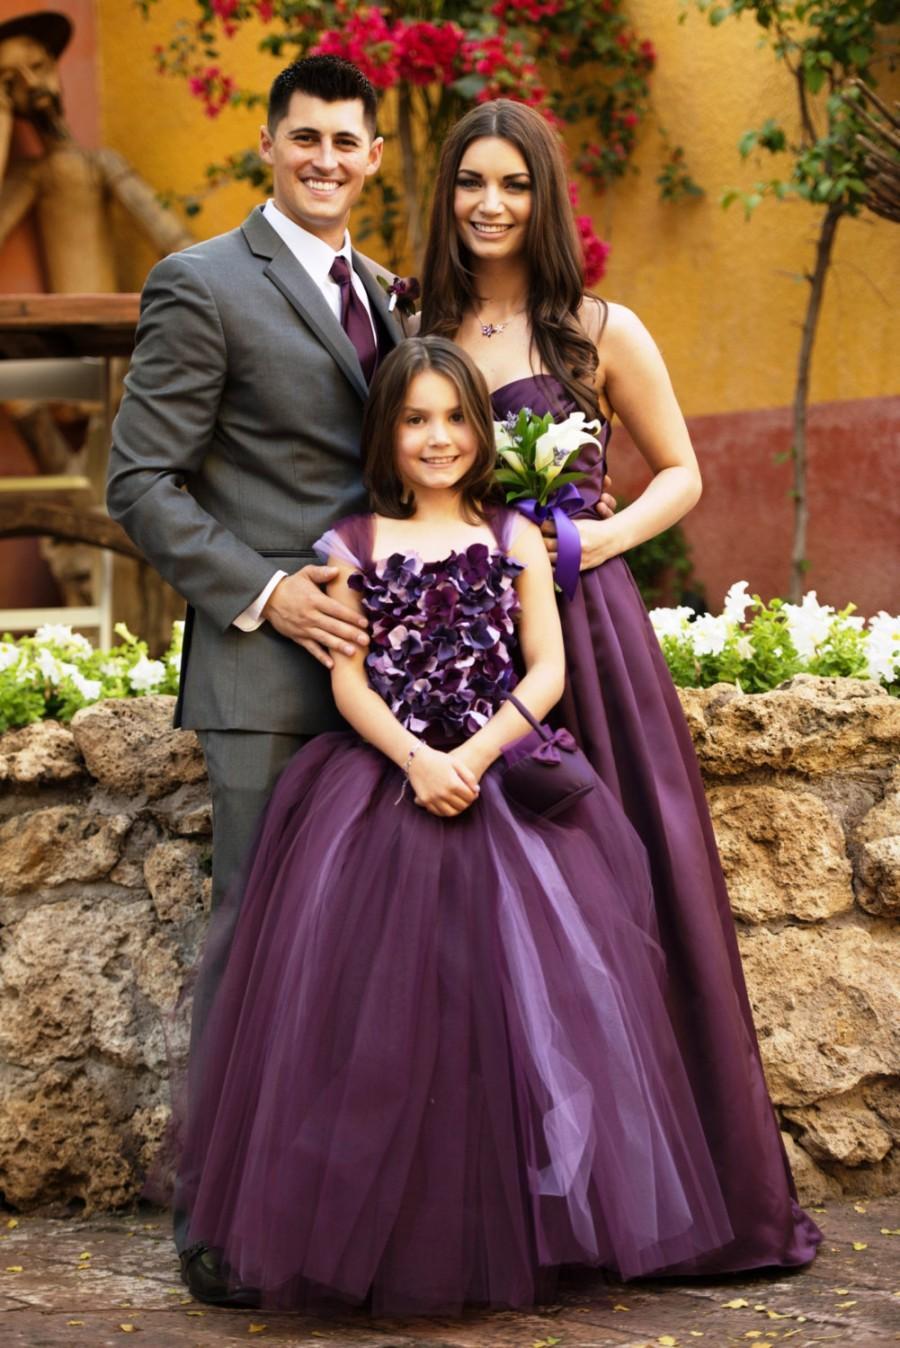 Wedding - Flower girl dress, Eggplant Flower girl Dress, Wedding dress, Deep Purple tutu dress, flower top, hydrangea top, toddler tutu dress